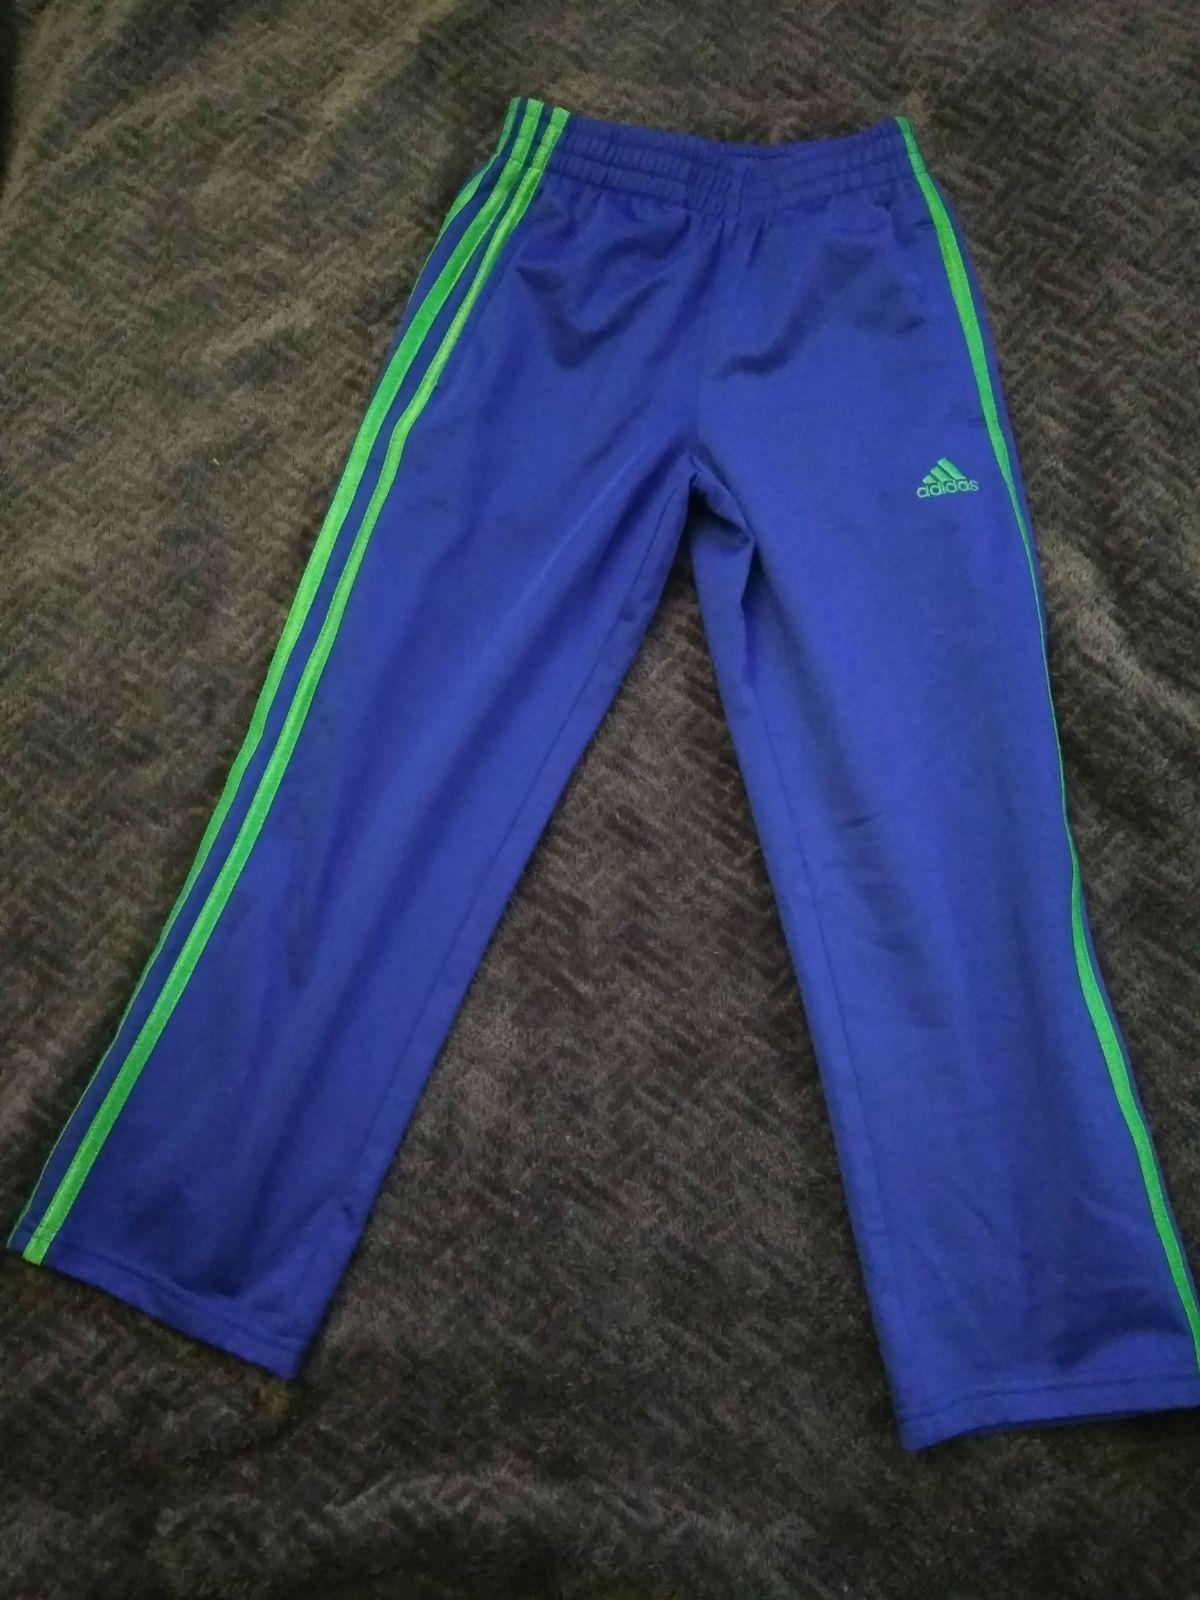 Kids size 7 Adidas pants